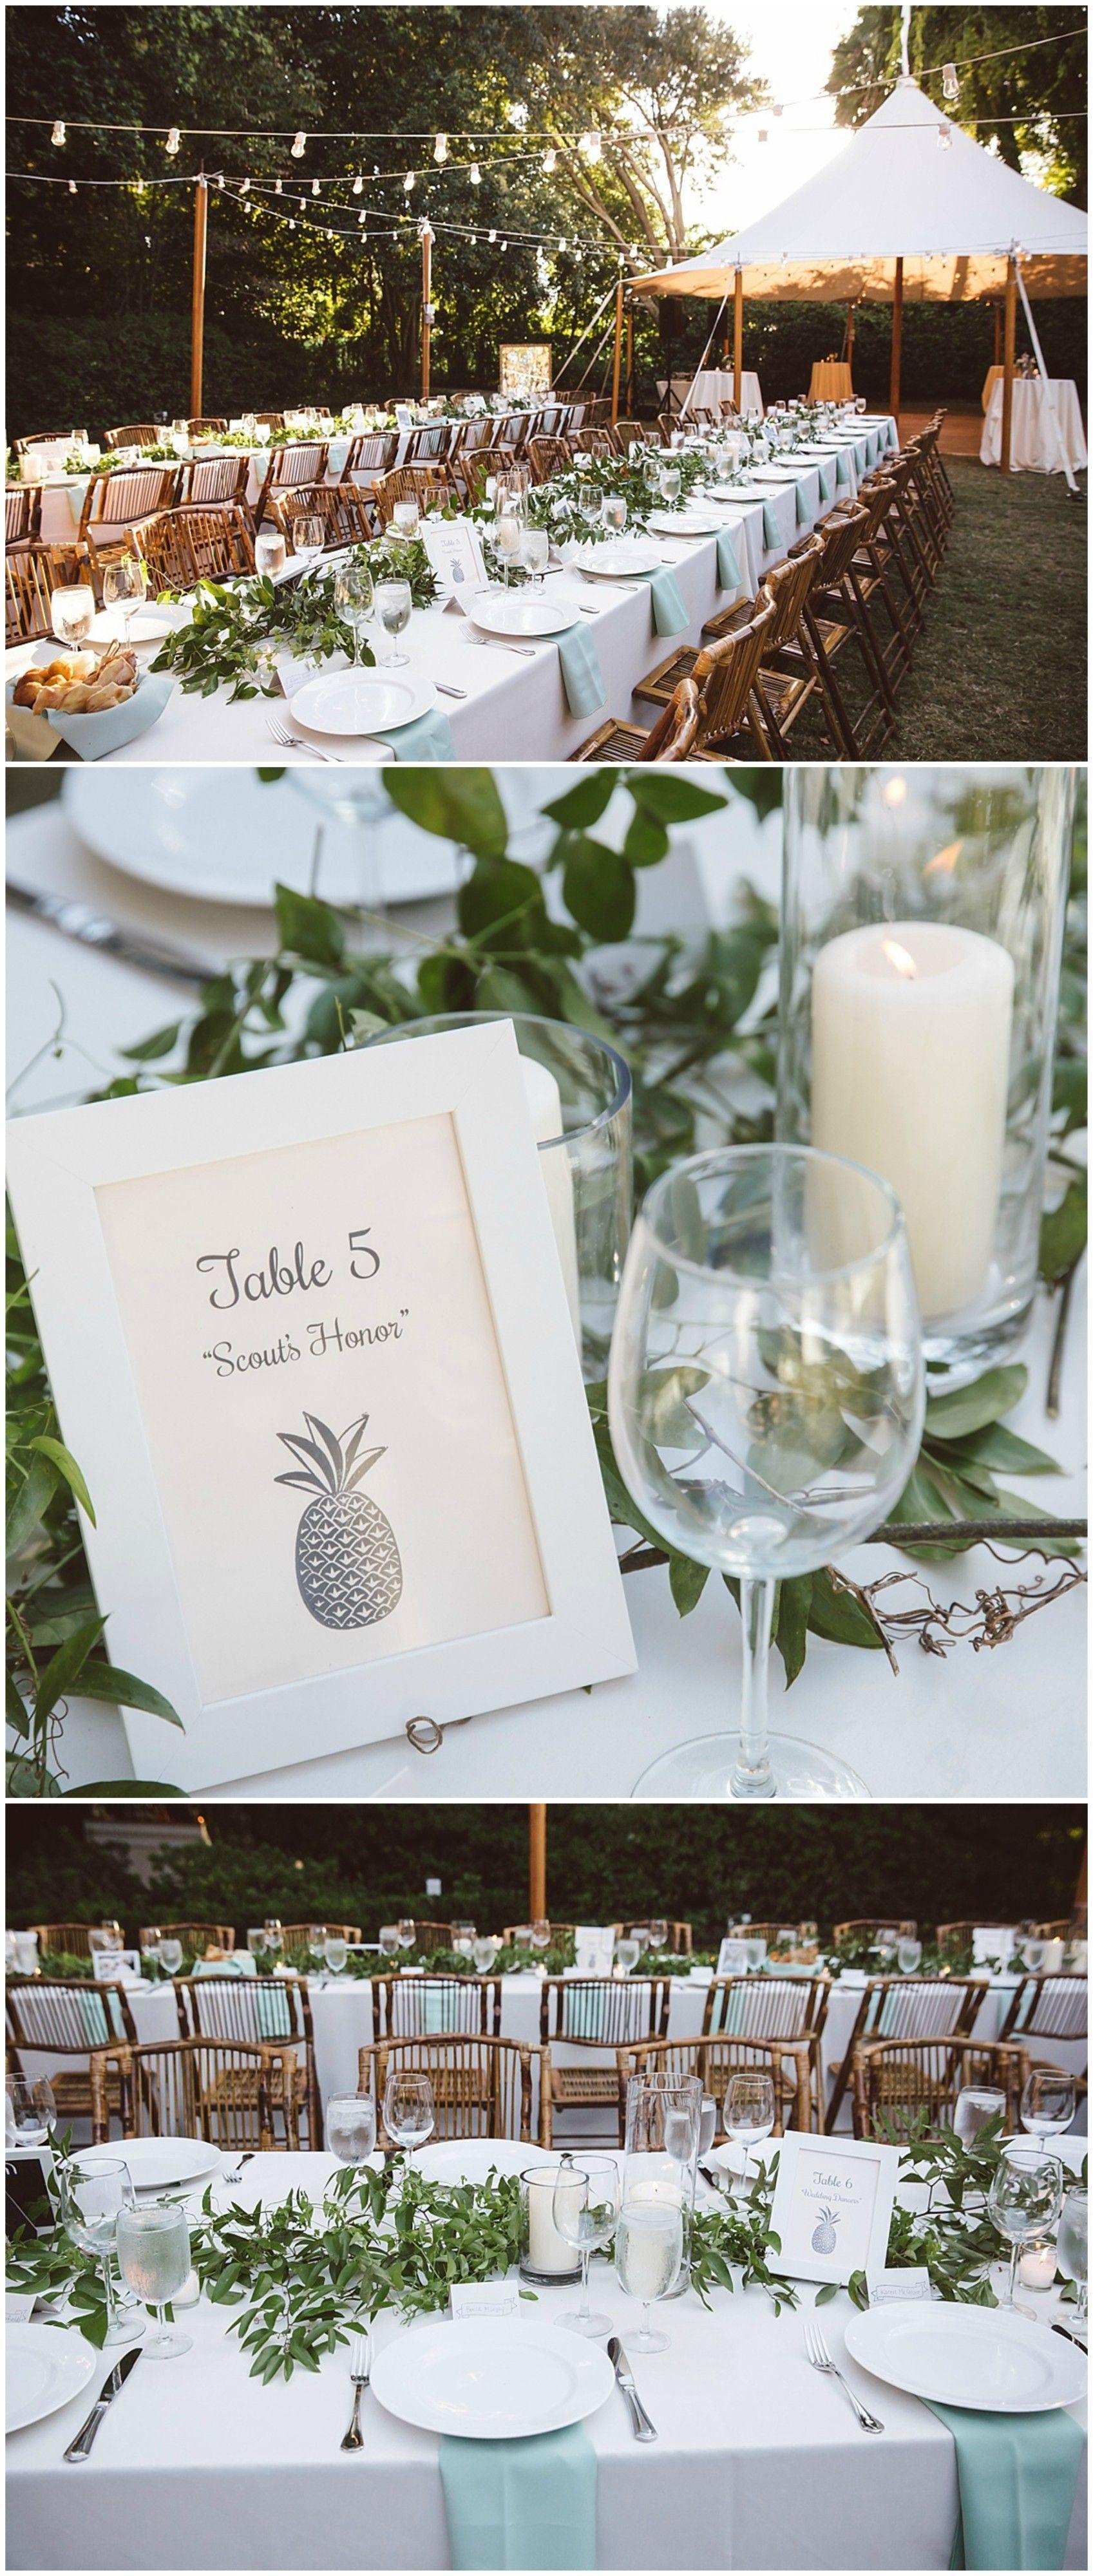 The Smarter Way to Wed | Tent lighting, Back garden weddings and ...